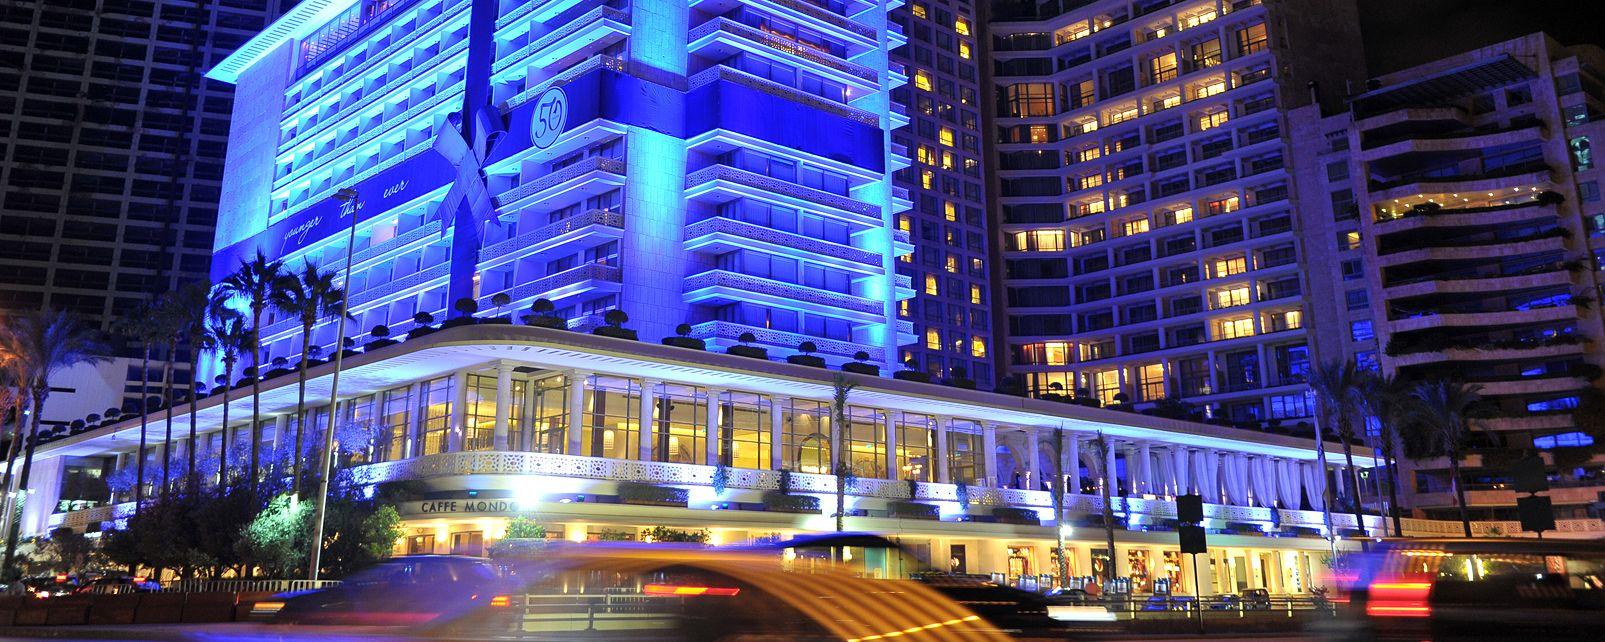 Hôtel InterContinental Phoenicia Beirut